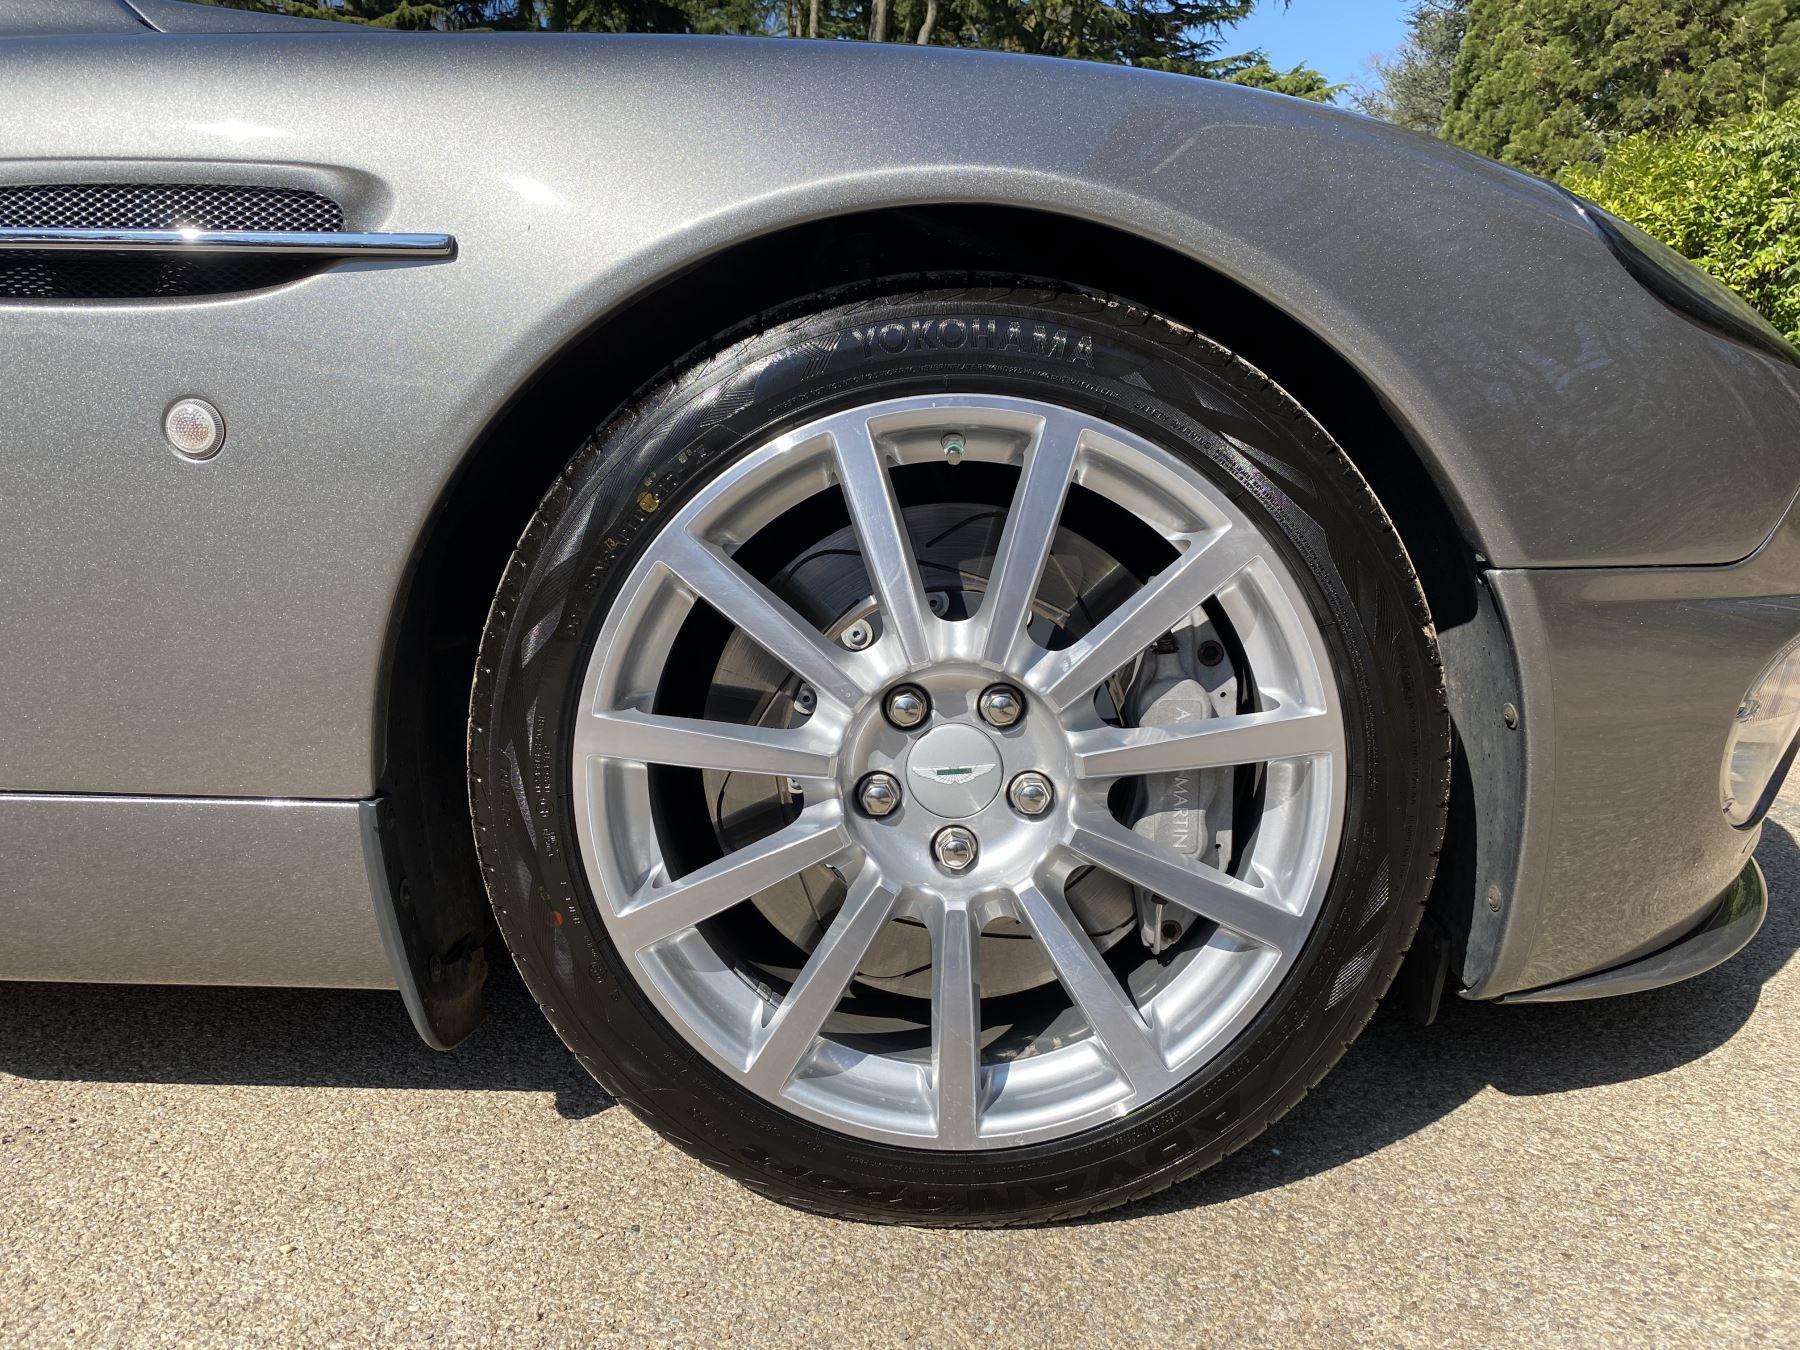 Aston Martin Vanquish S S V12 2+2 2dr image 16